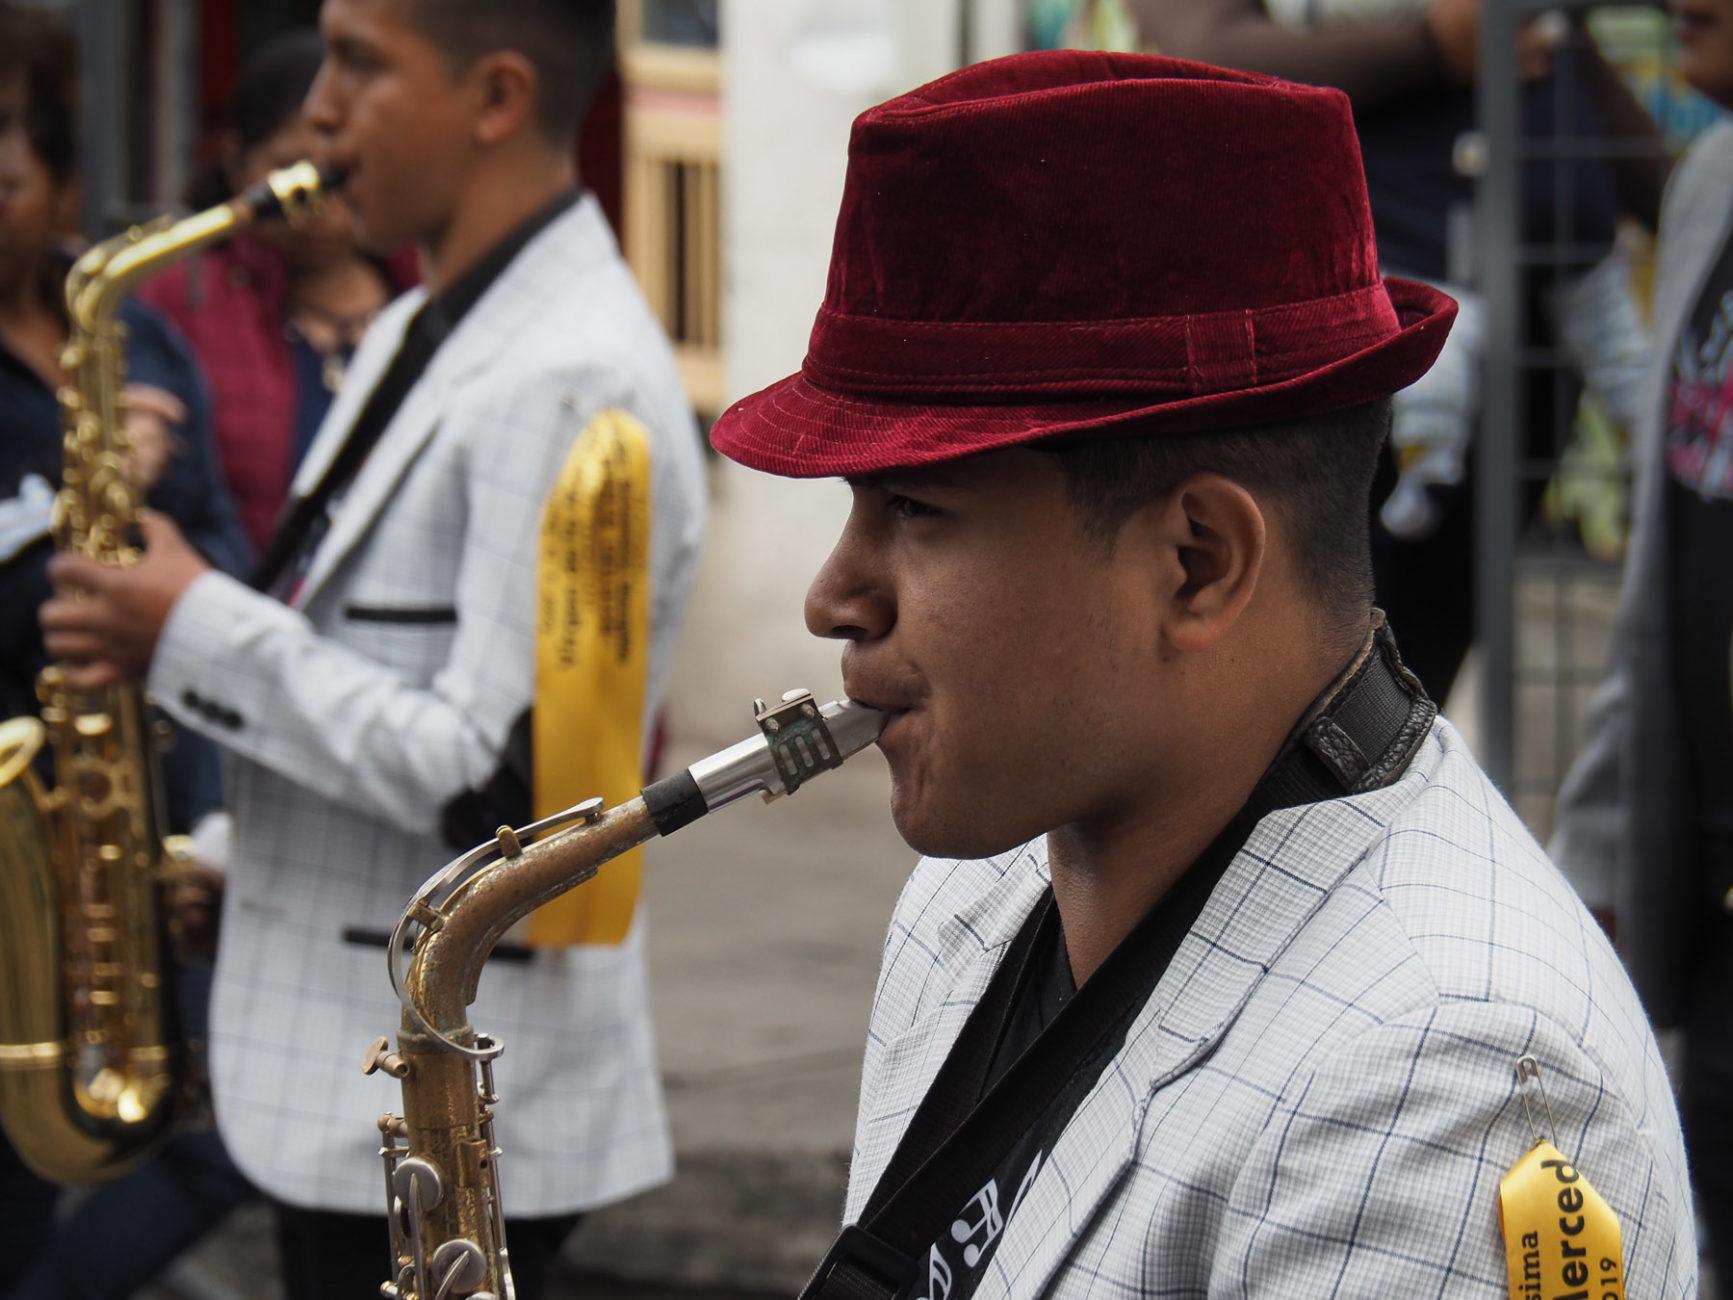 Die Saxophonspieler